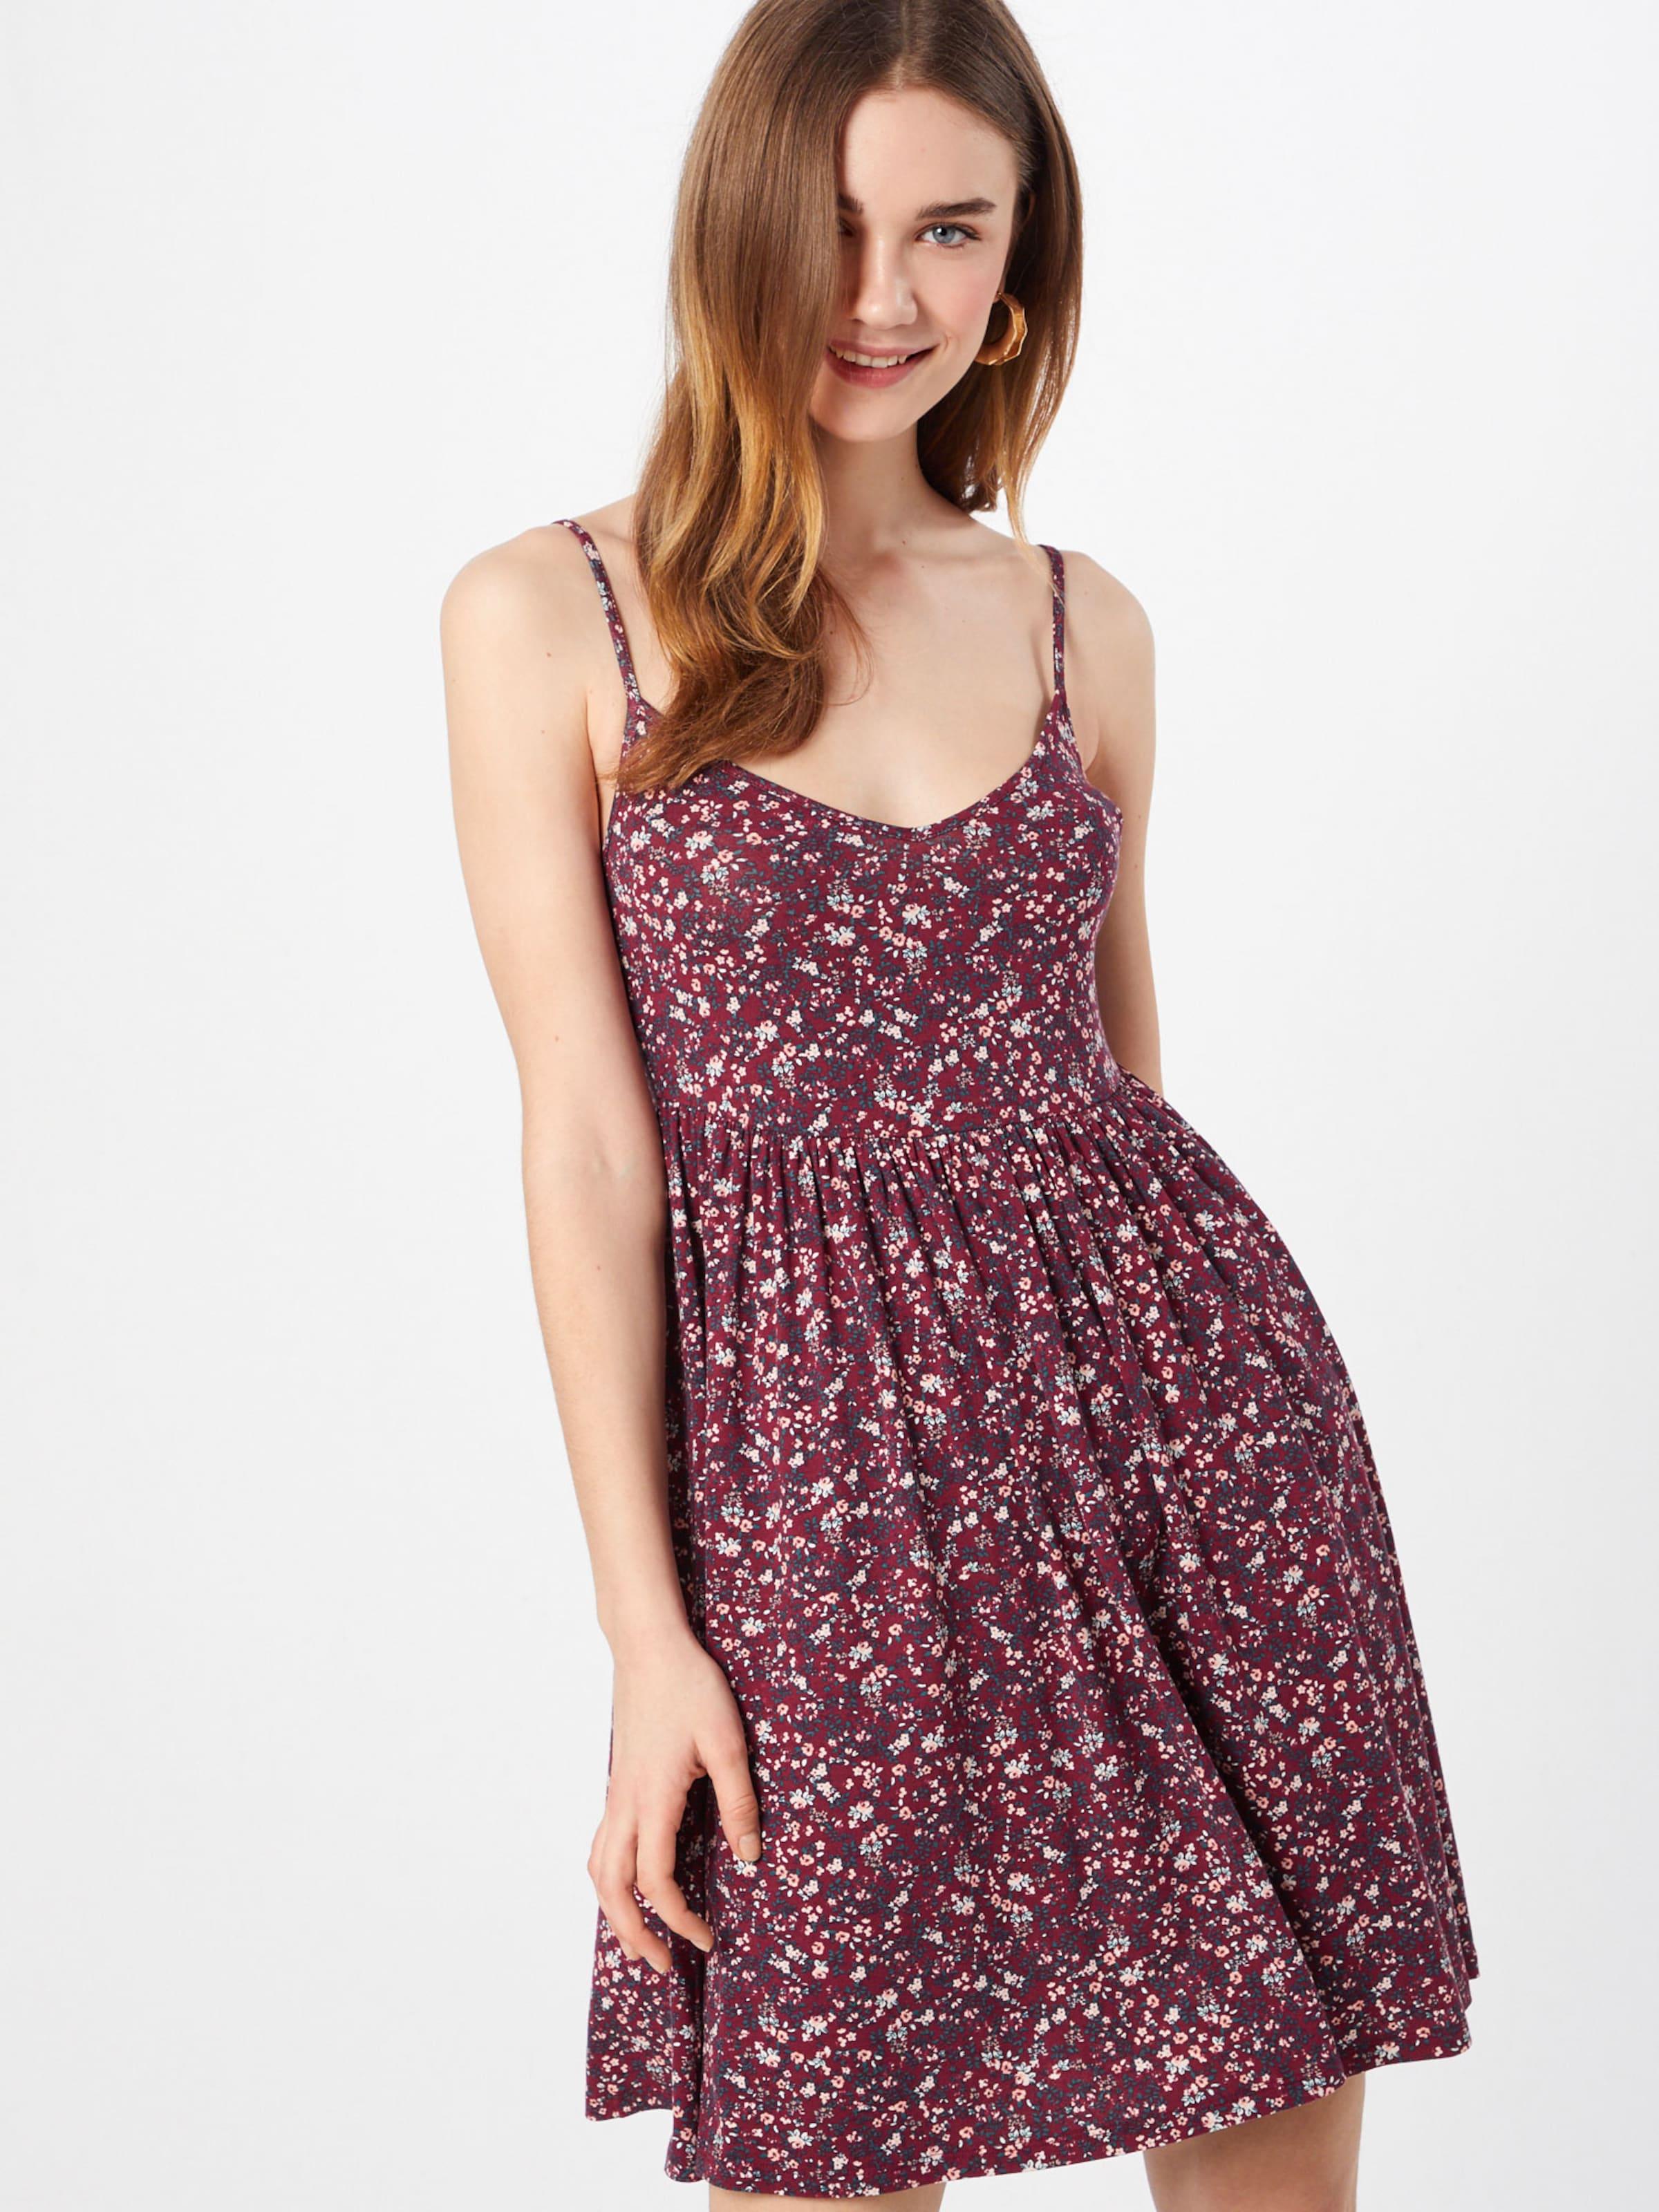 MischfarbenBordeaux 'lavina' You About Kleid In n0wOPk8